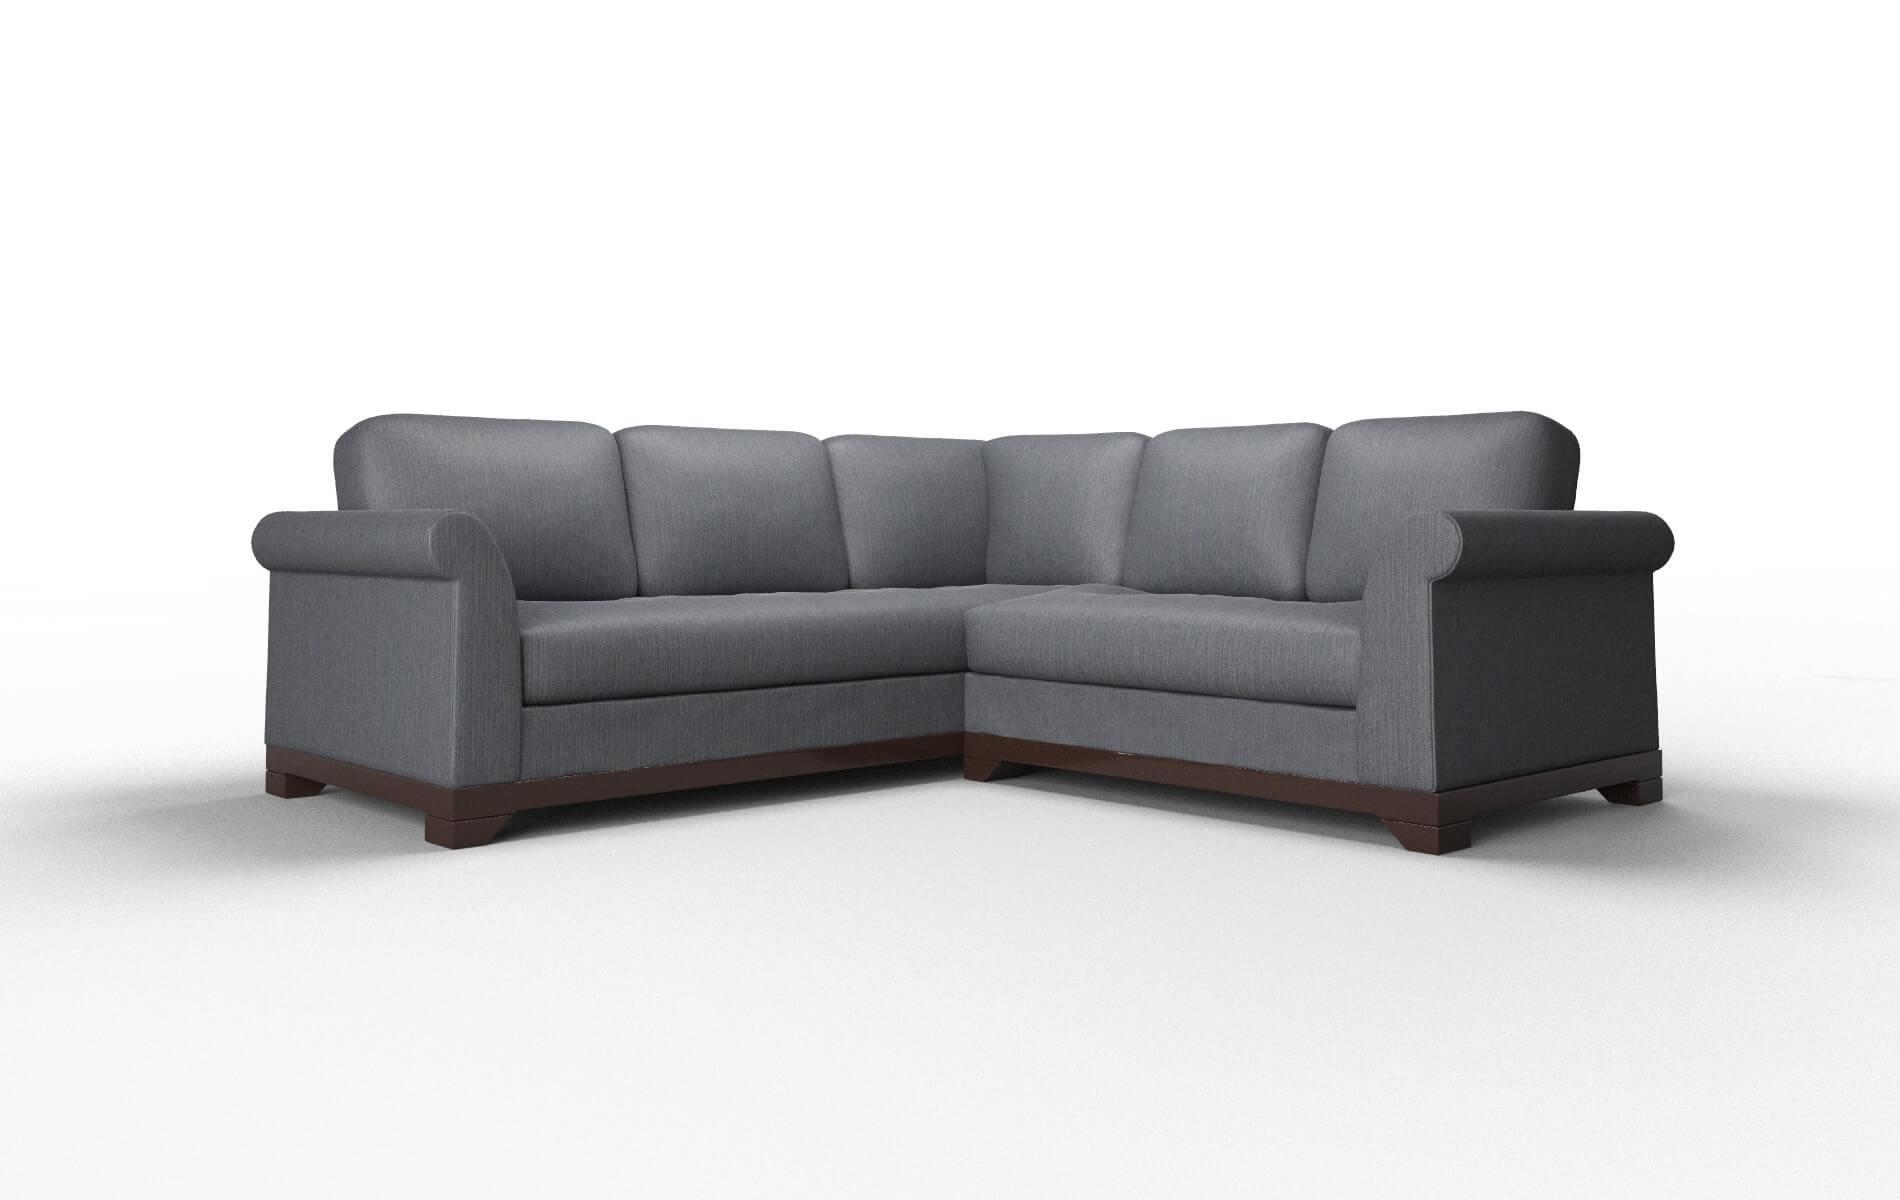 Sensational Denver Bergamo Dove Sectional Dreamsofa Evergreenethics Interior Chair Design Evergreenethicsorg